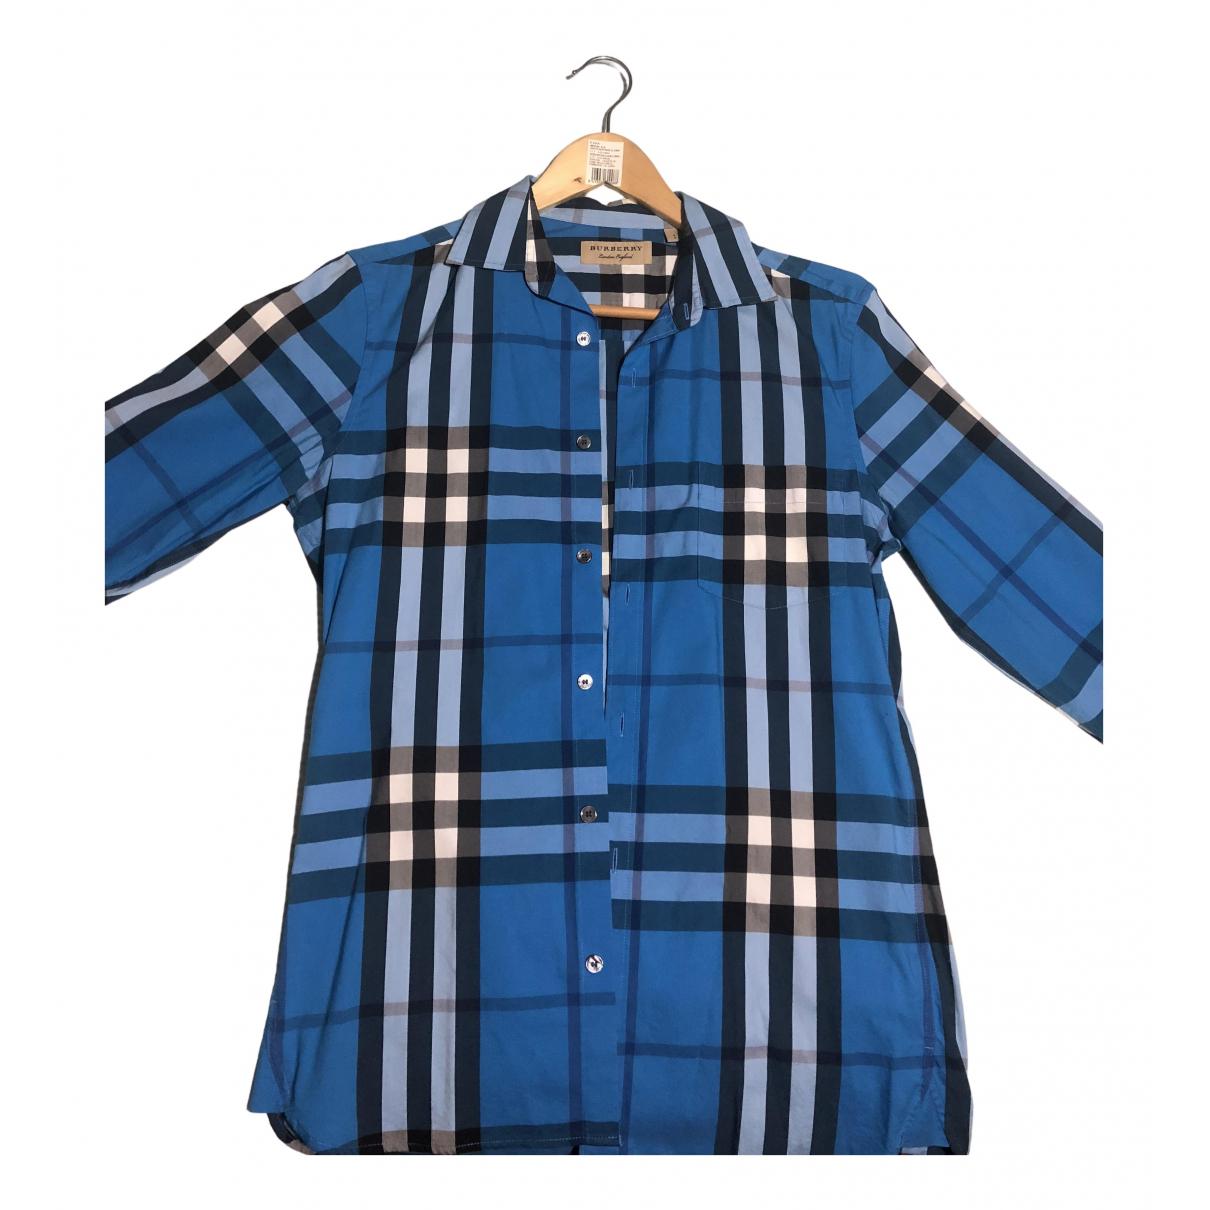 Burberry N Blue Cotton Shirts for Men S International